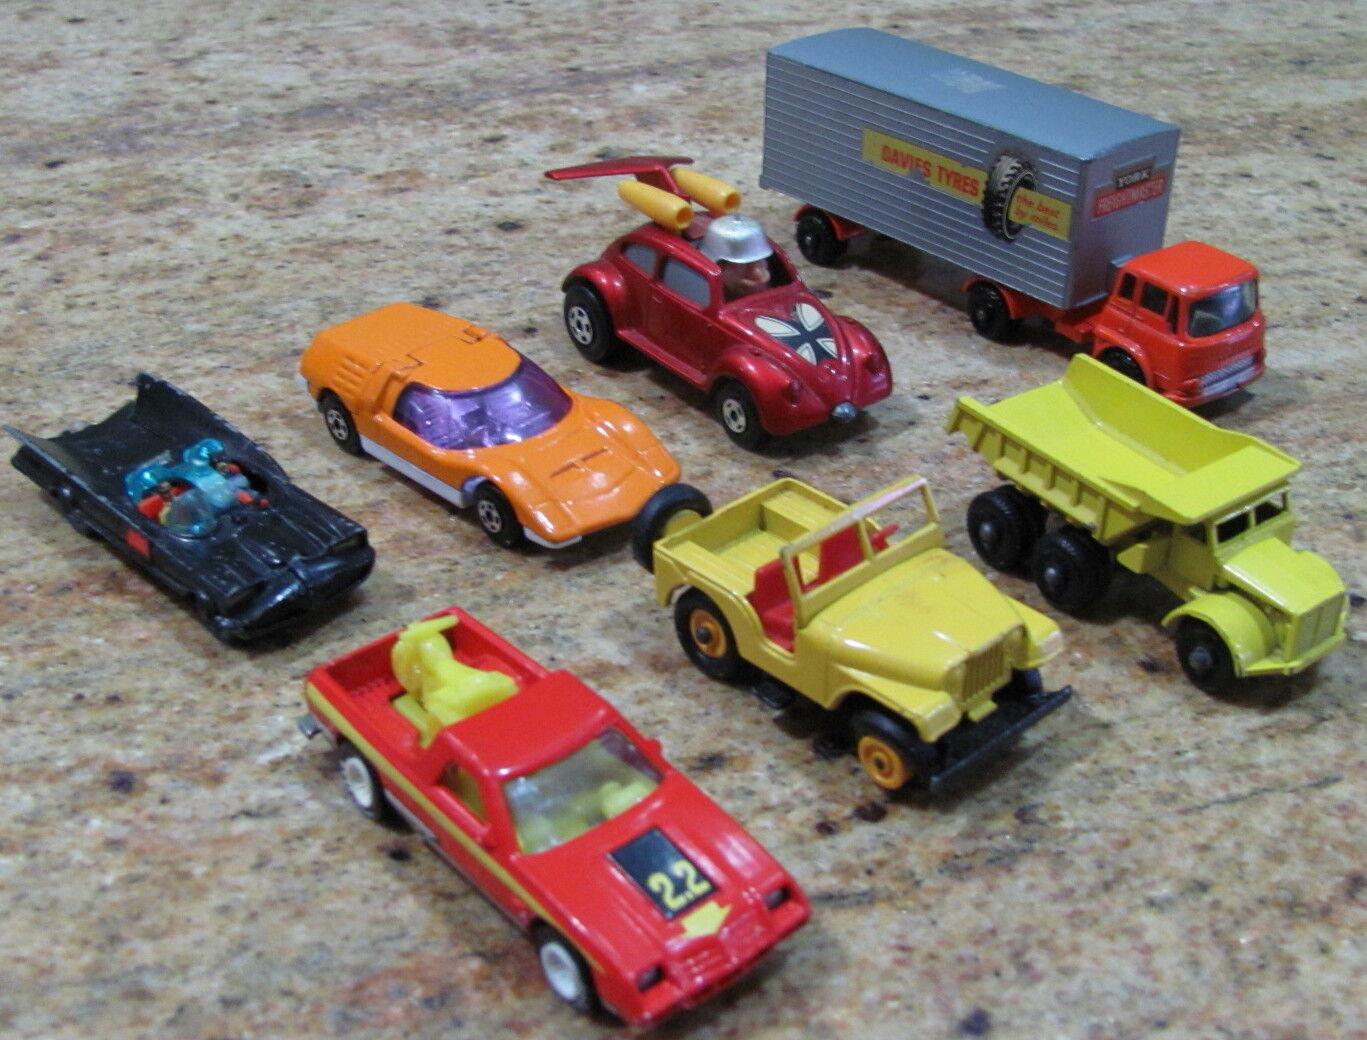 Lot of 5 Lesney Cars Hot Wheels & 1 Batman Die Cast Toy Vehicles, USC